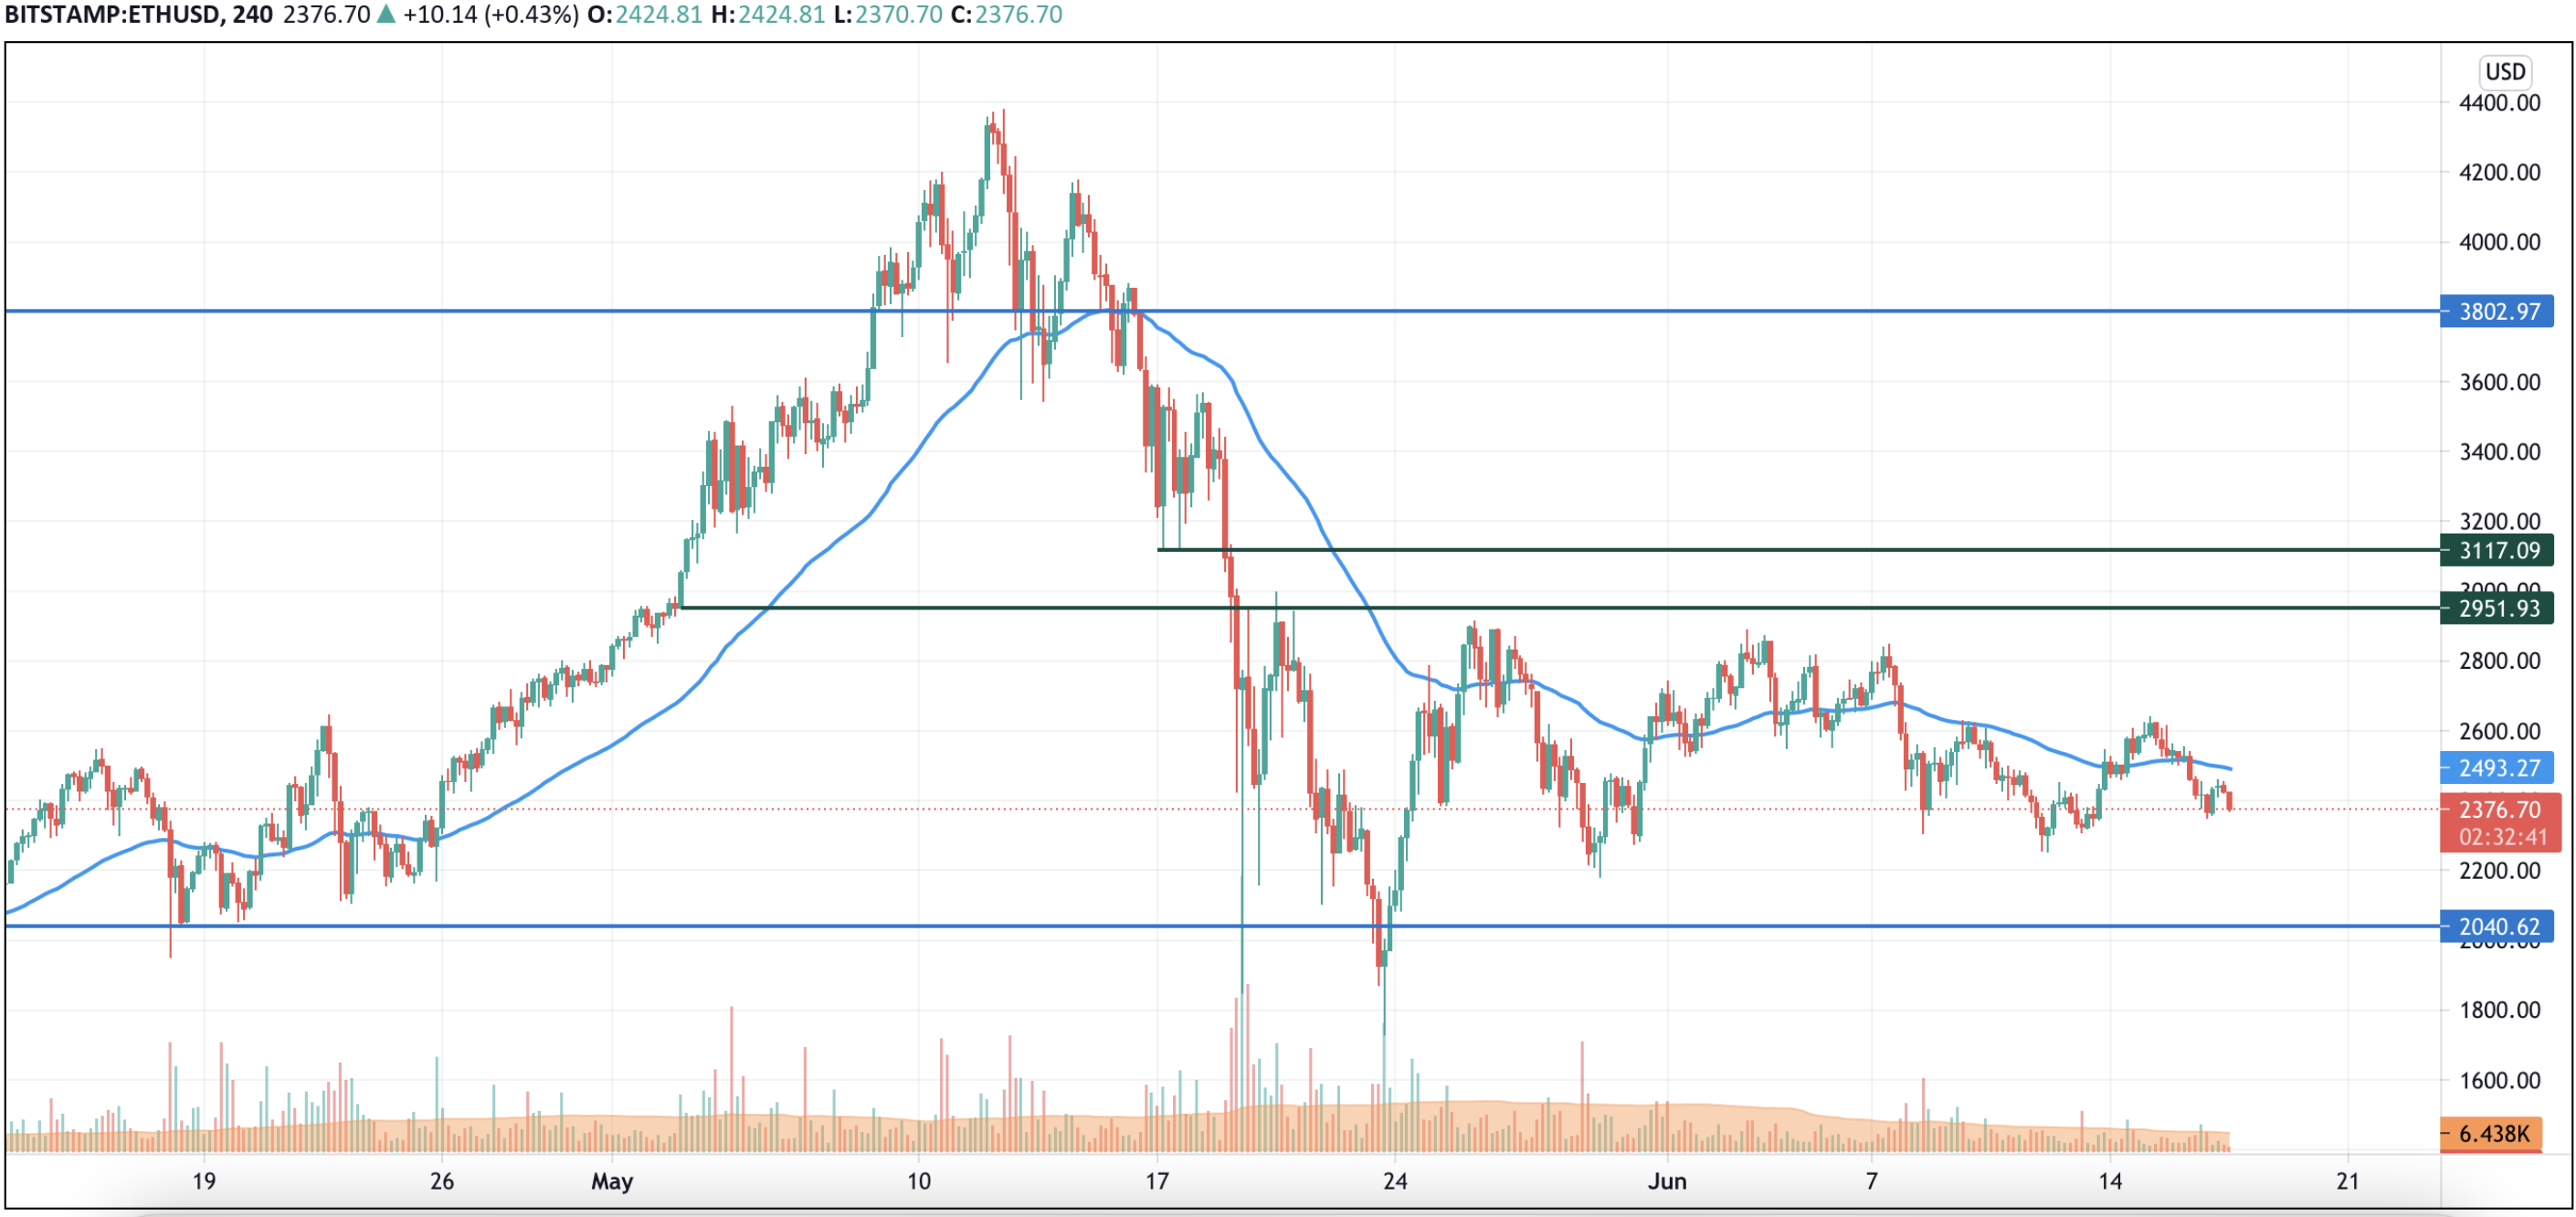 TradingView tarafından ETH/USD grafiği